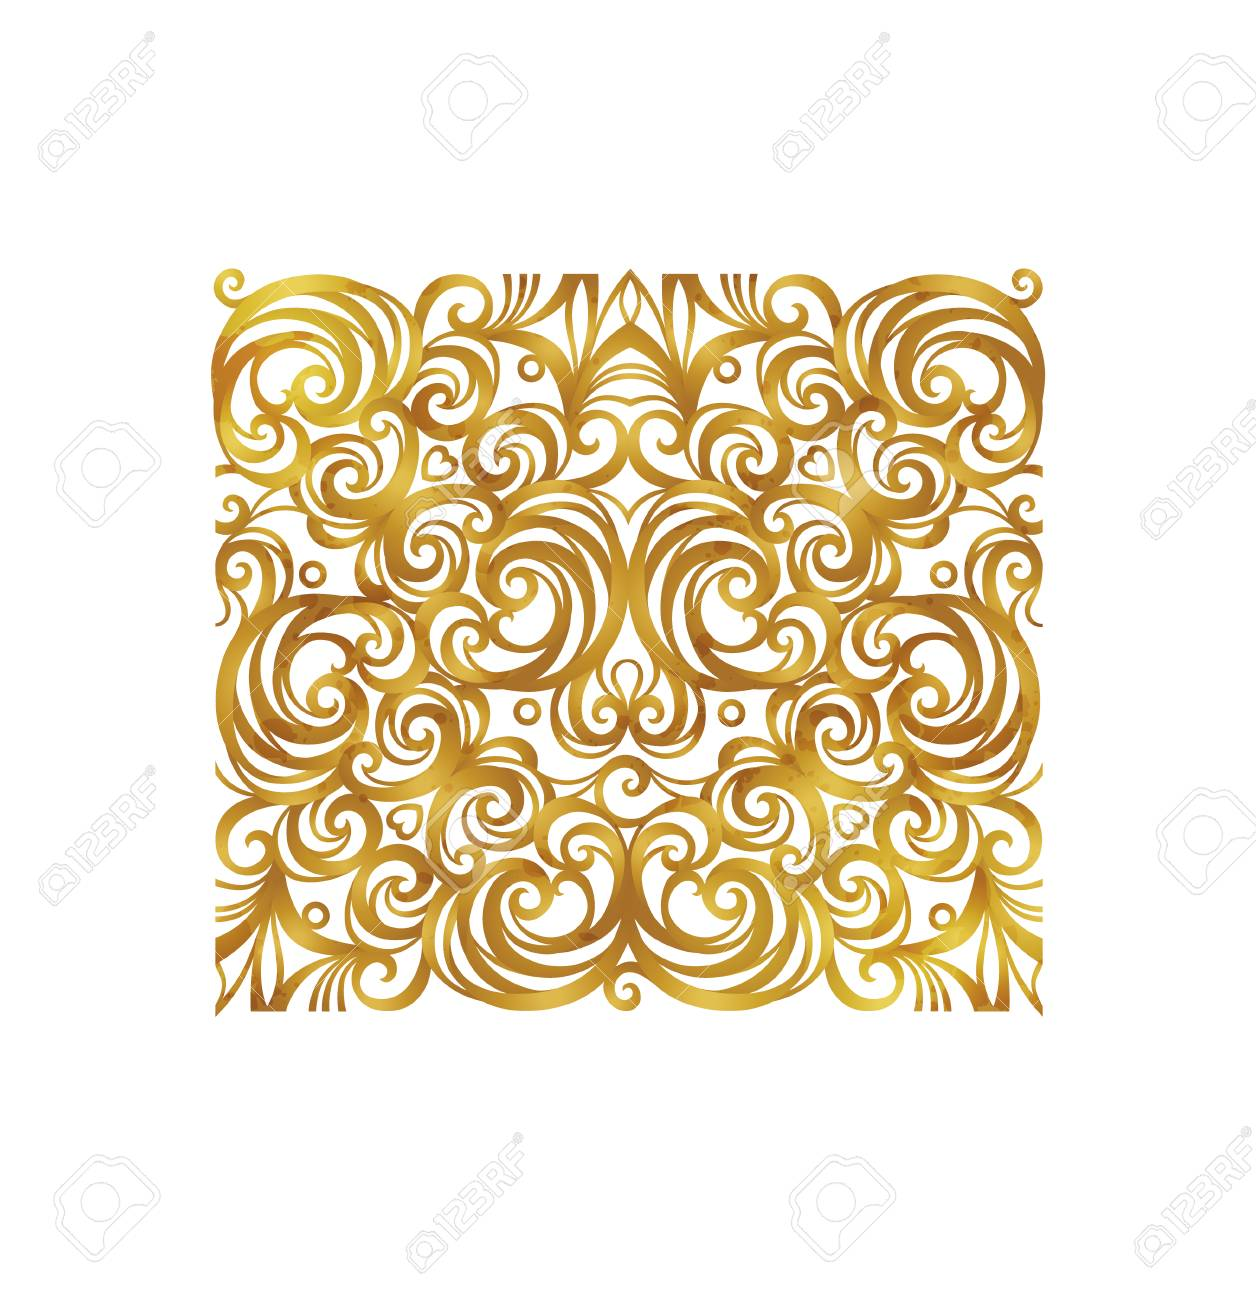 vector vintage square decor floral ornament for design template